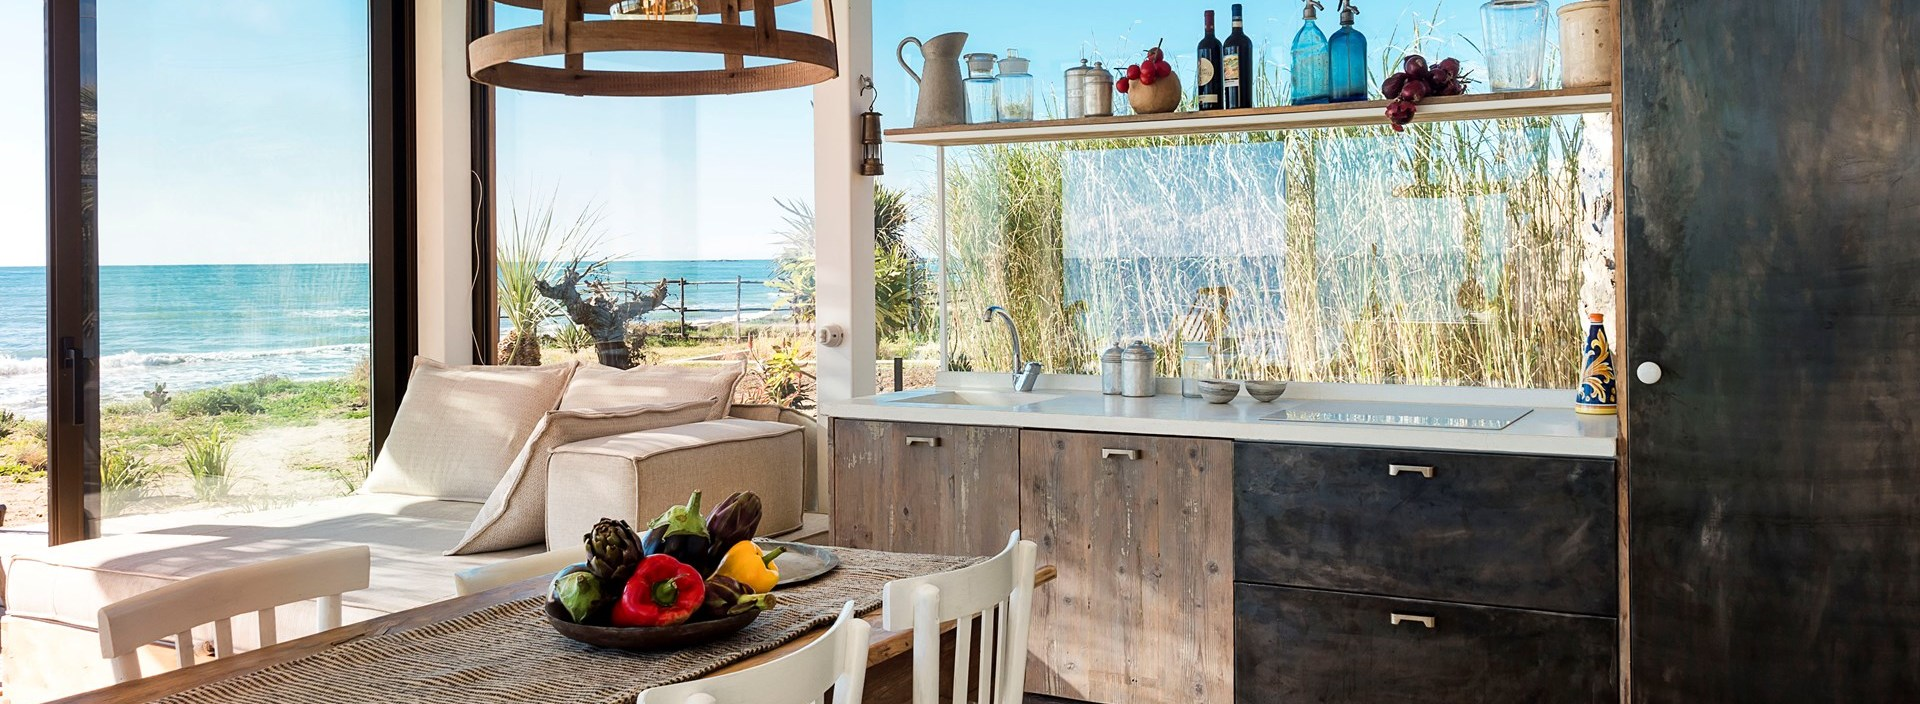 small-family-beach-villa-sicily